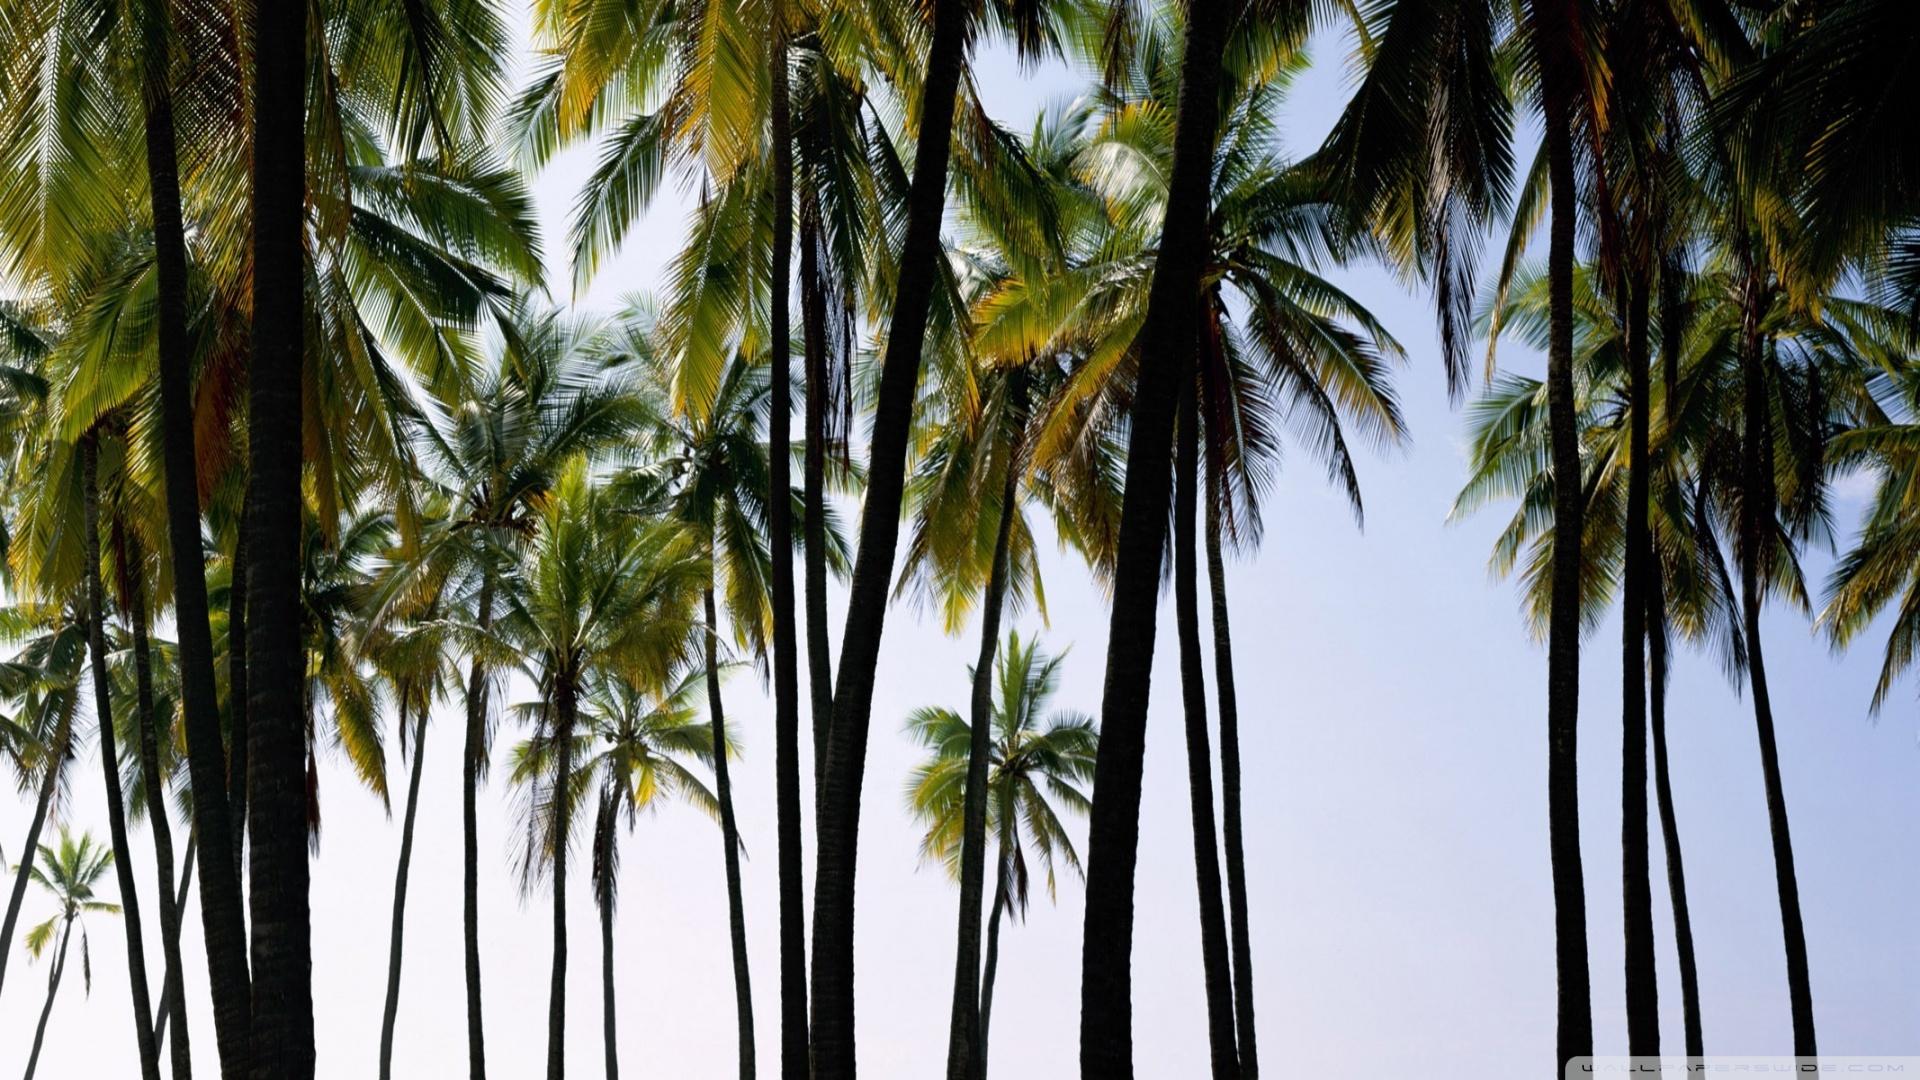 palm trees tumblr. Palm Trees 2 Wallpaper 1920x1080 Tumblr